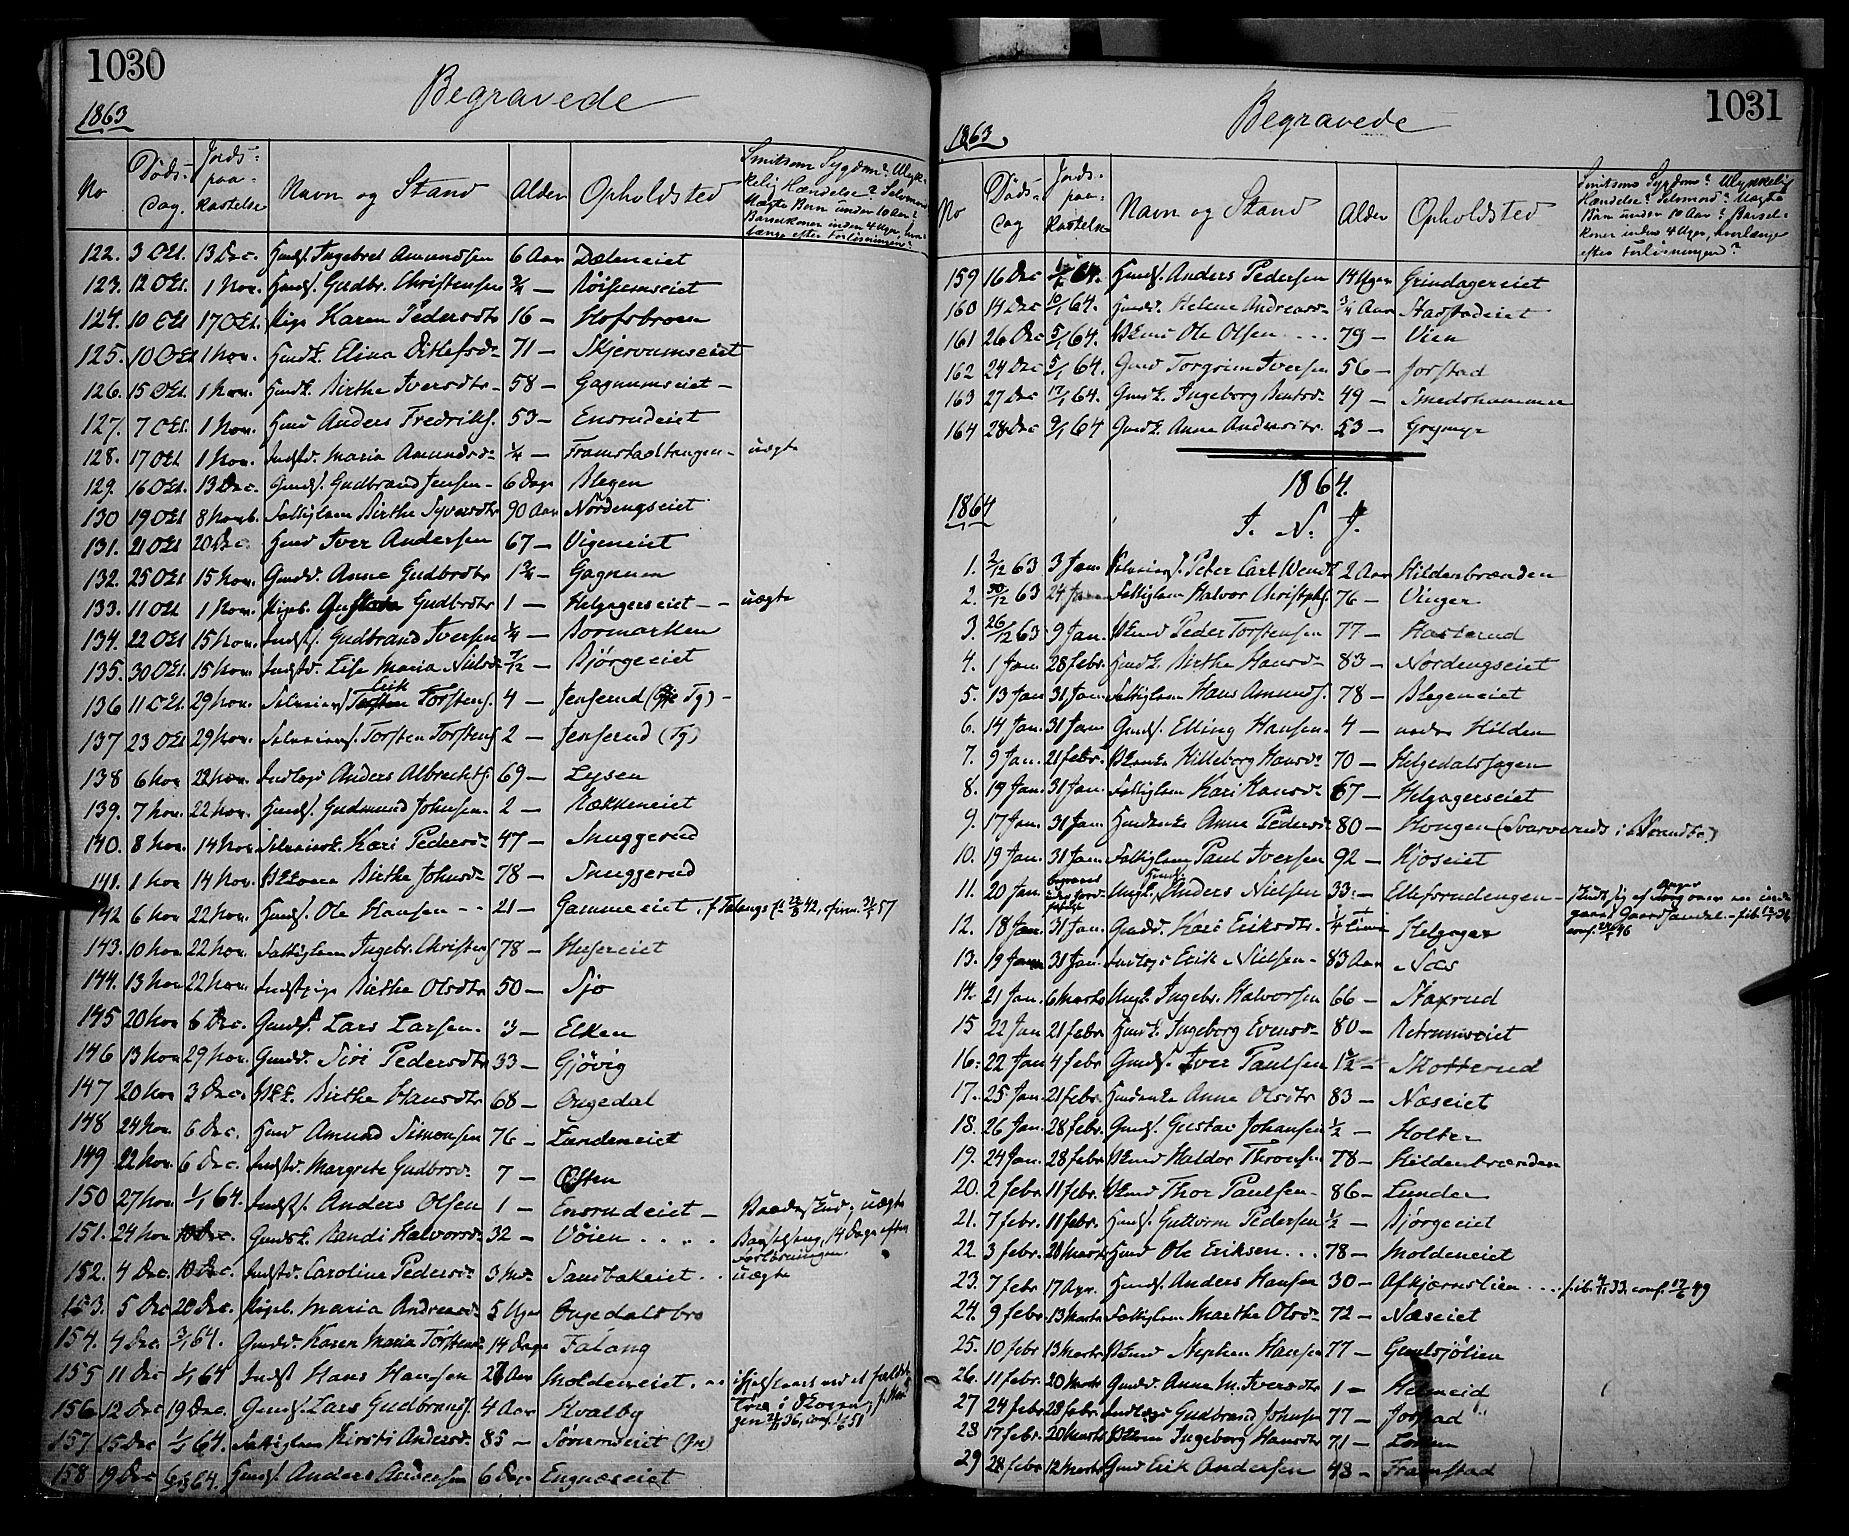 SAH, Gran prestekontor, Ministerialbok nr. 12, 1856-1874, s. 1030-1031